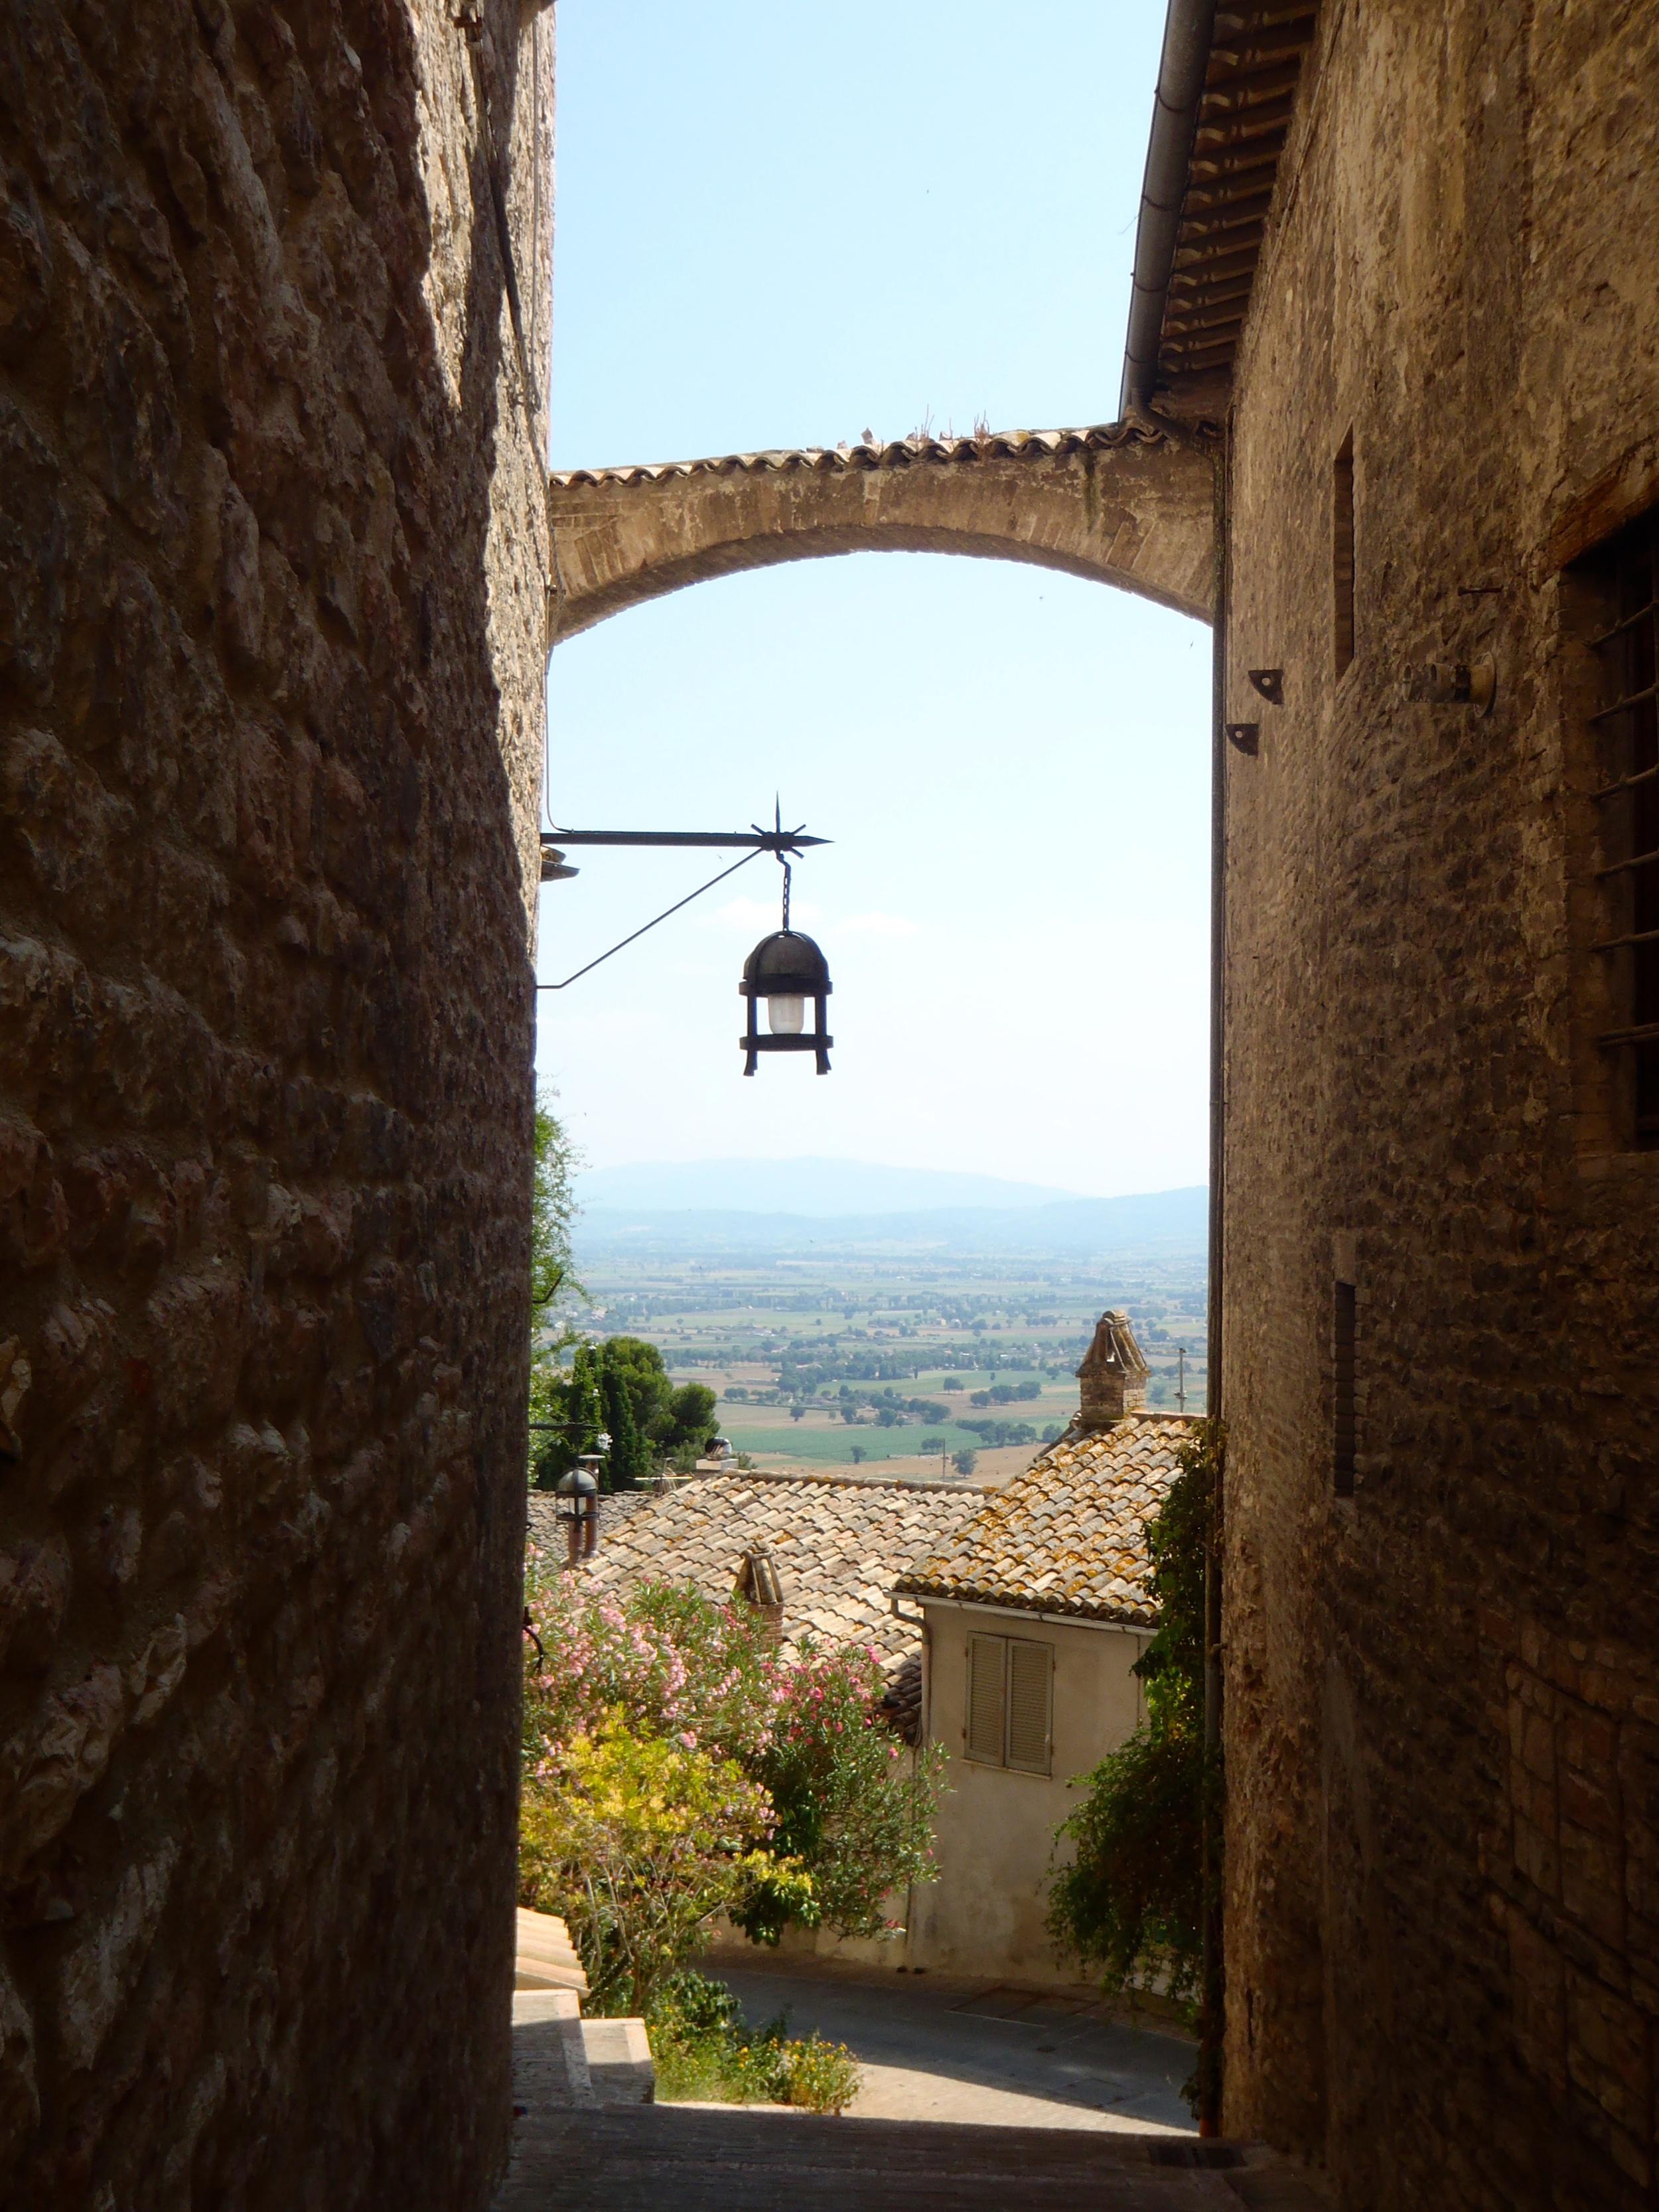 CRO Italy web 2013 - 020.jpg